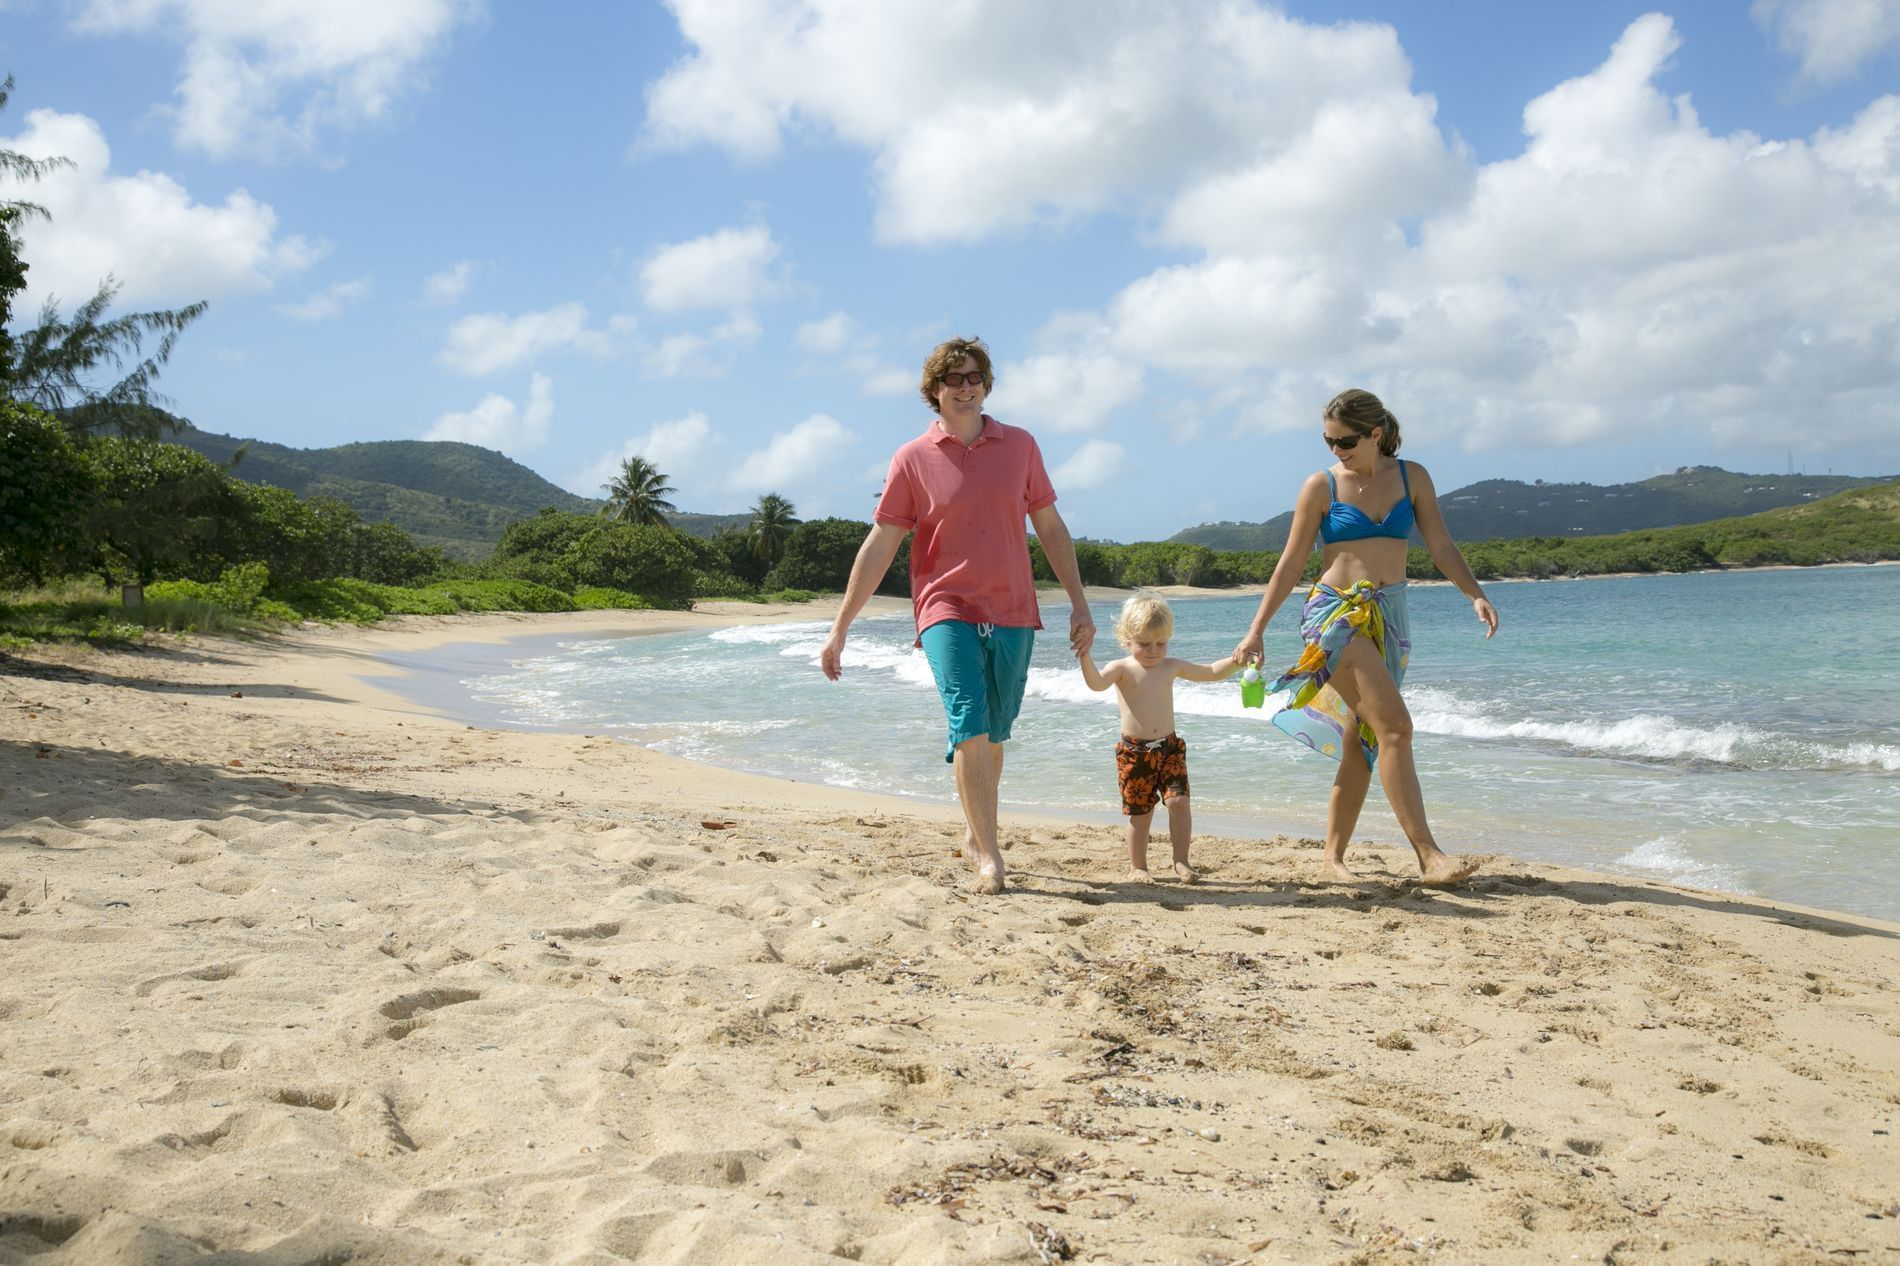 Family Strolling on beach